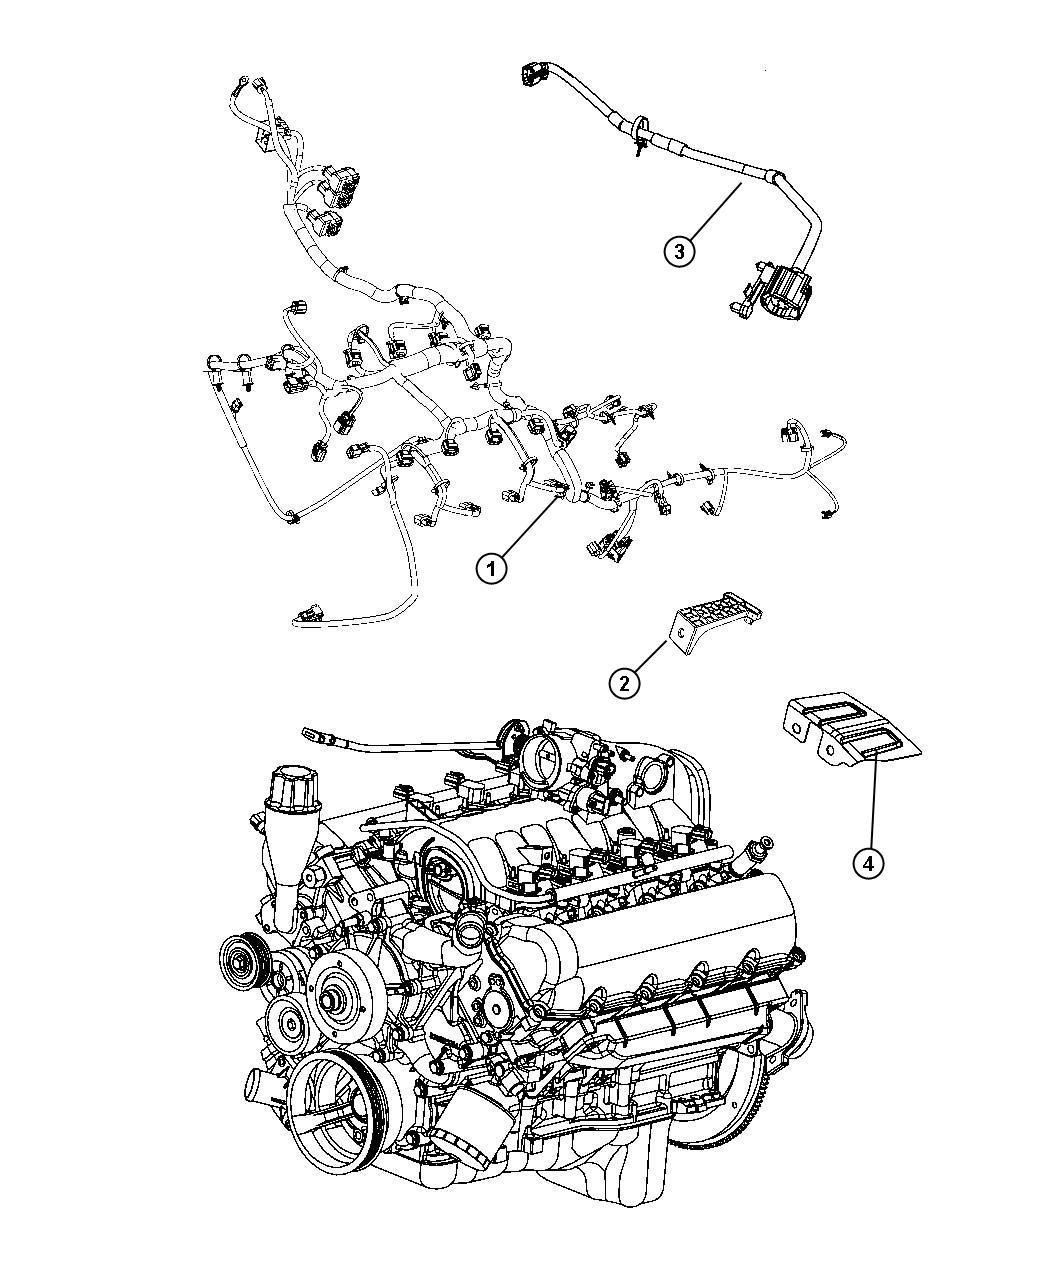 Dodge Ram Wiring Engine Bad Dh3 Elec Case